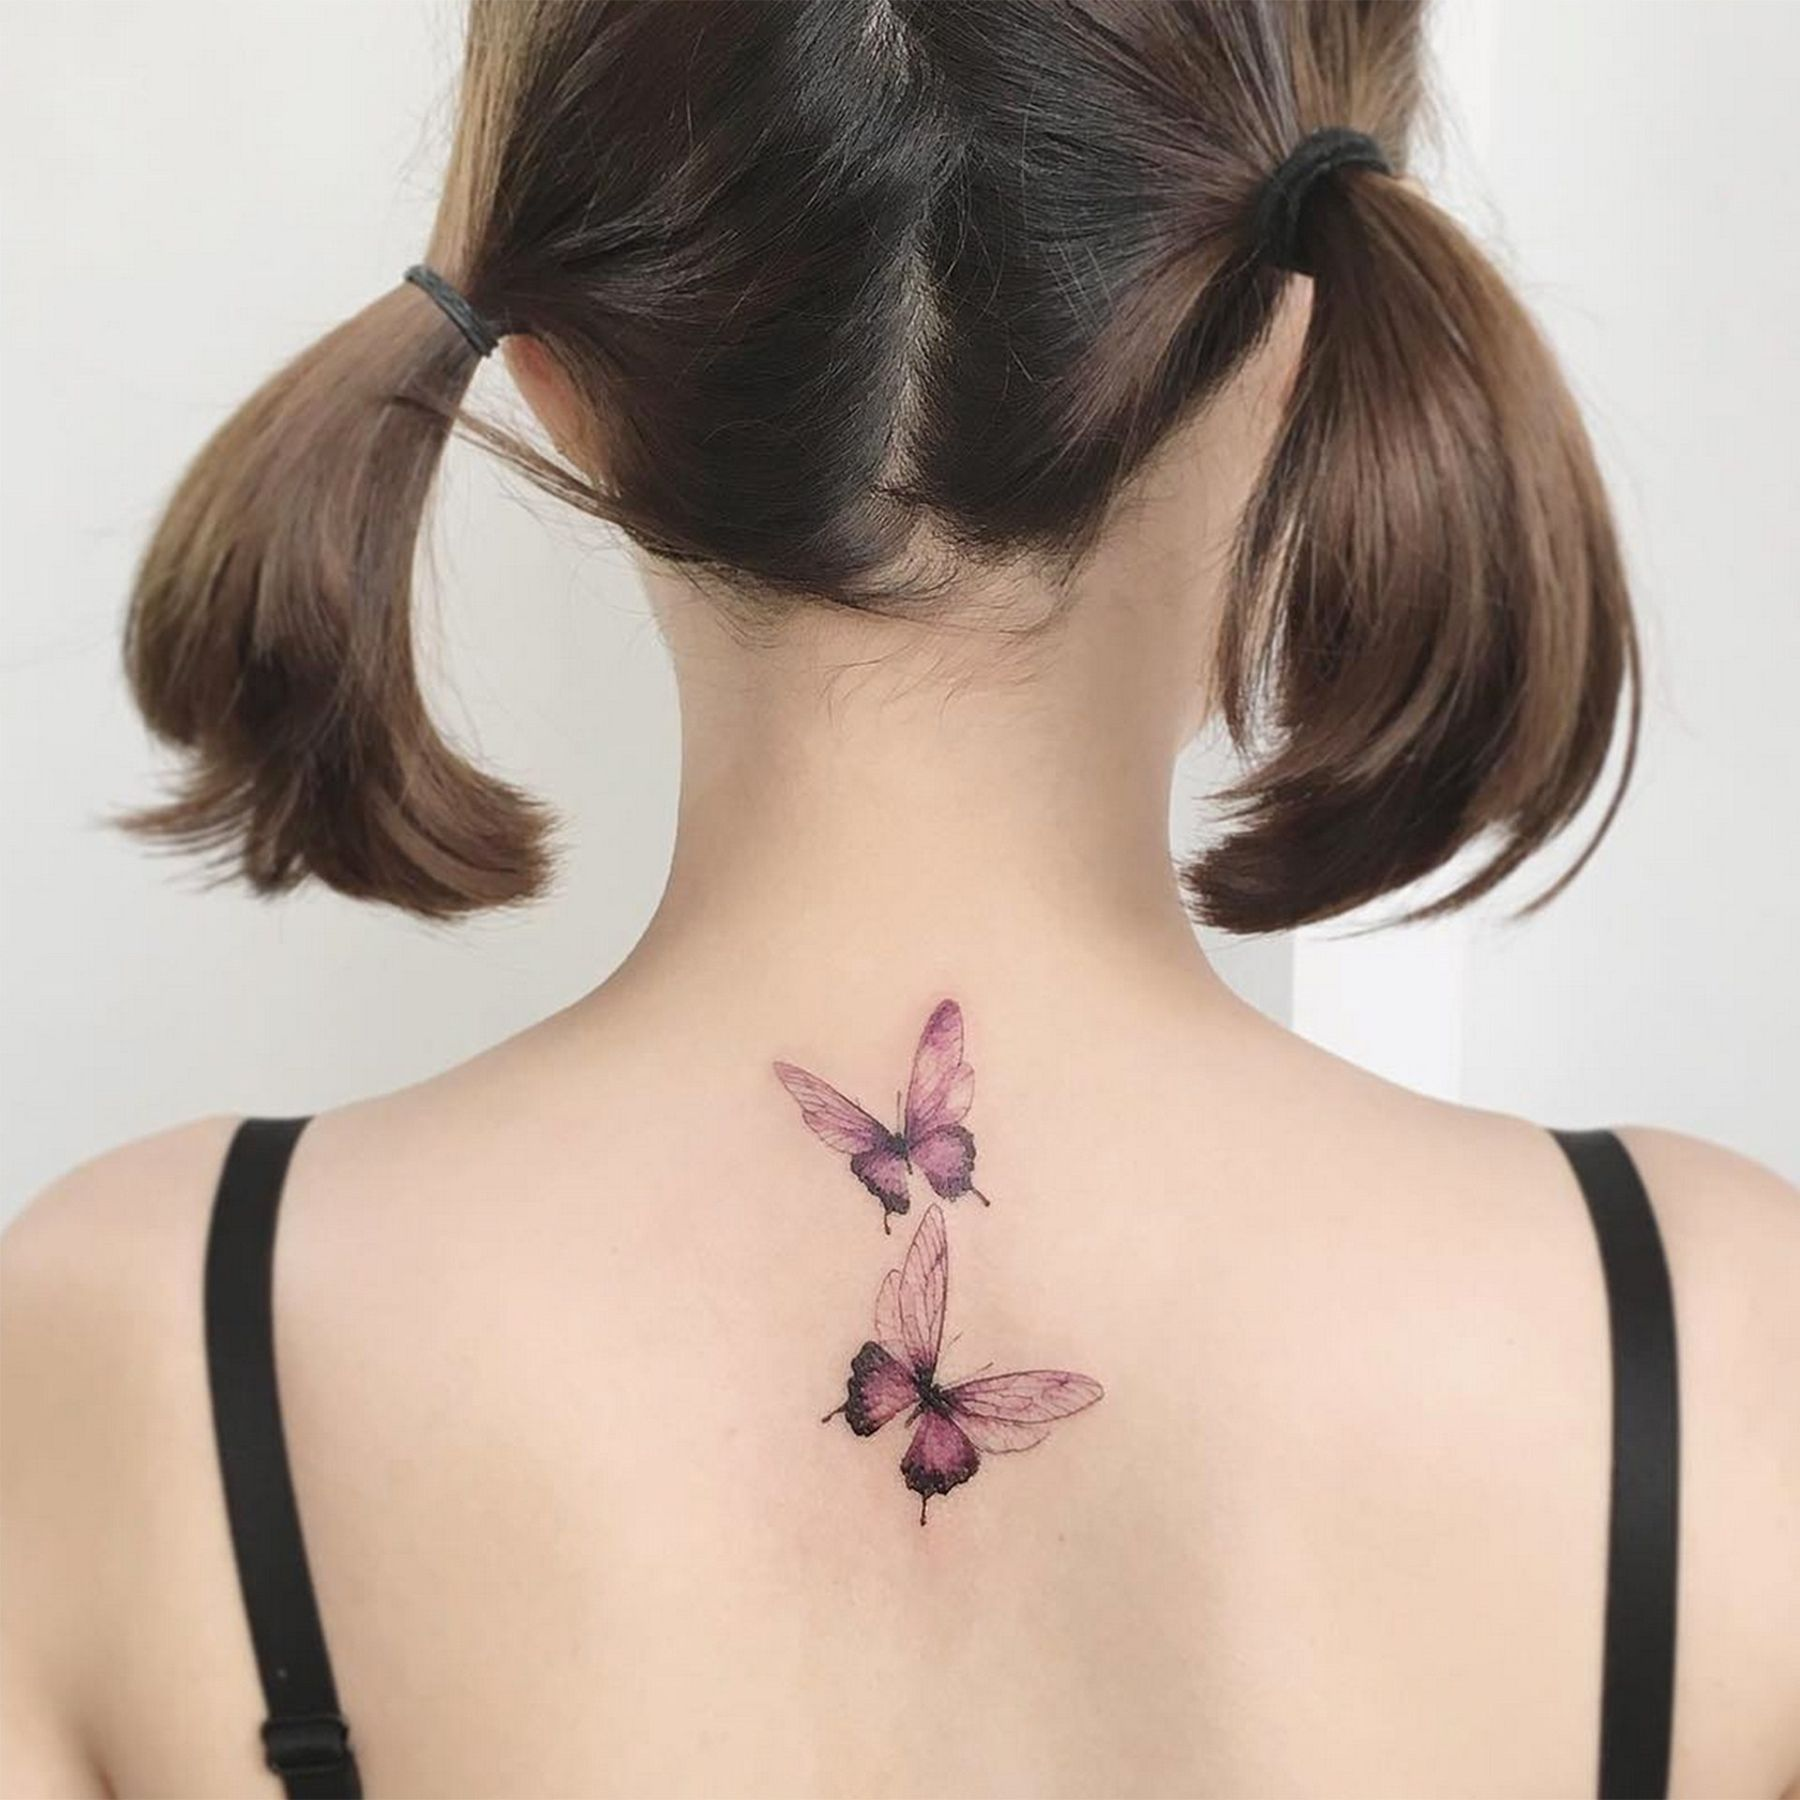 cute tattoo ideas the ultimate instagram inkspiration small